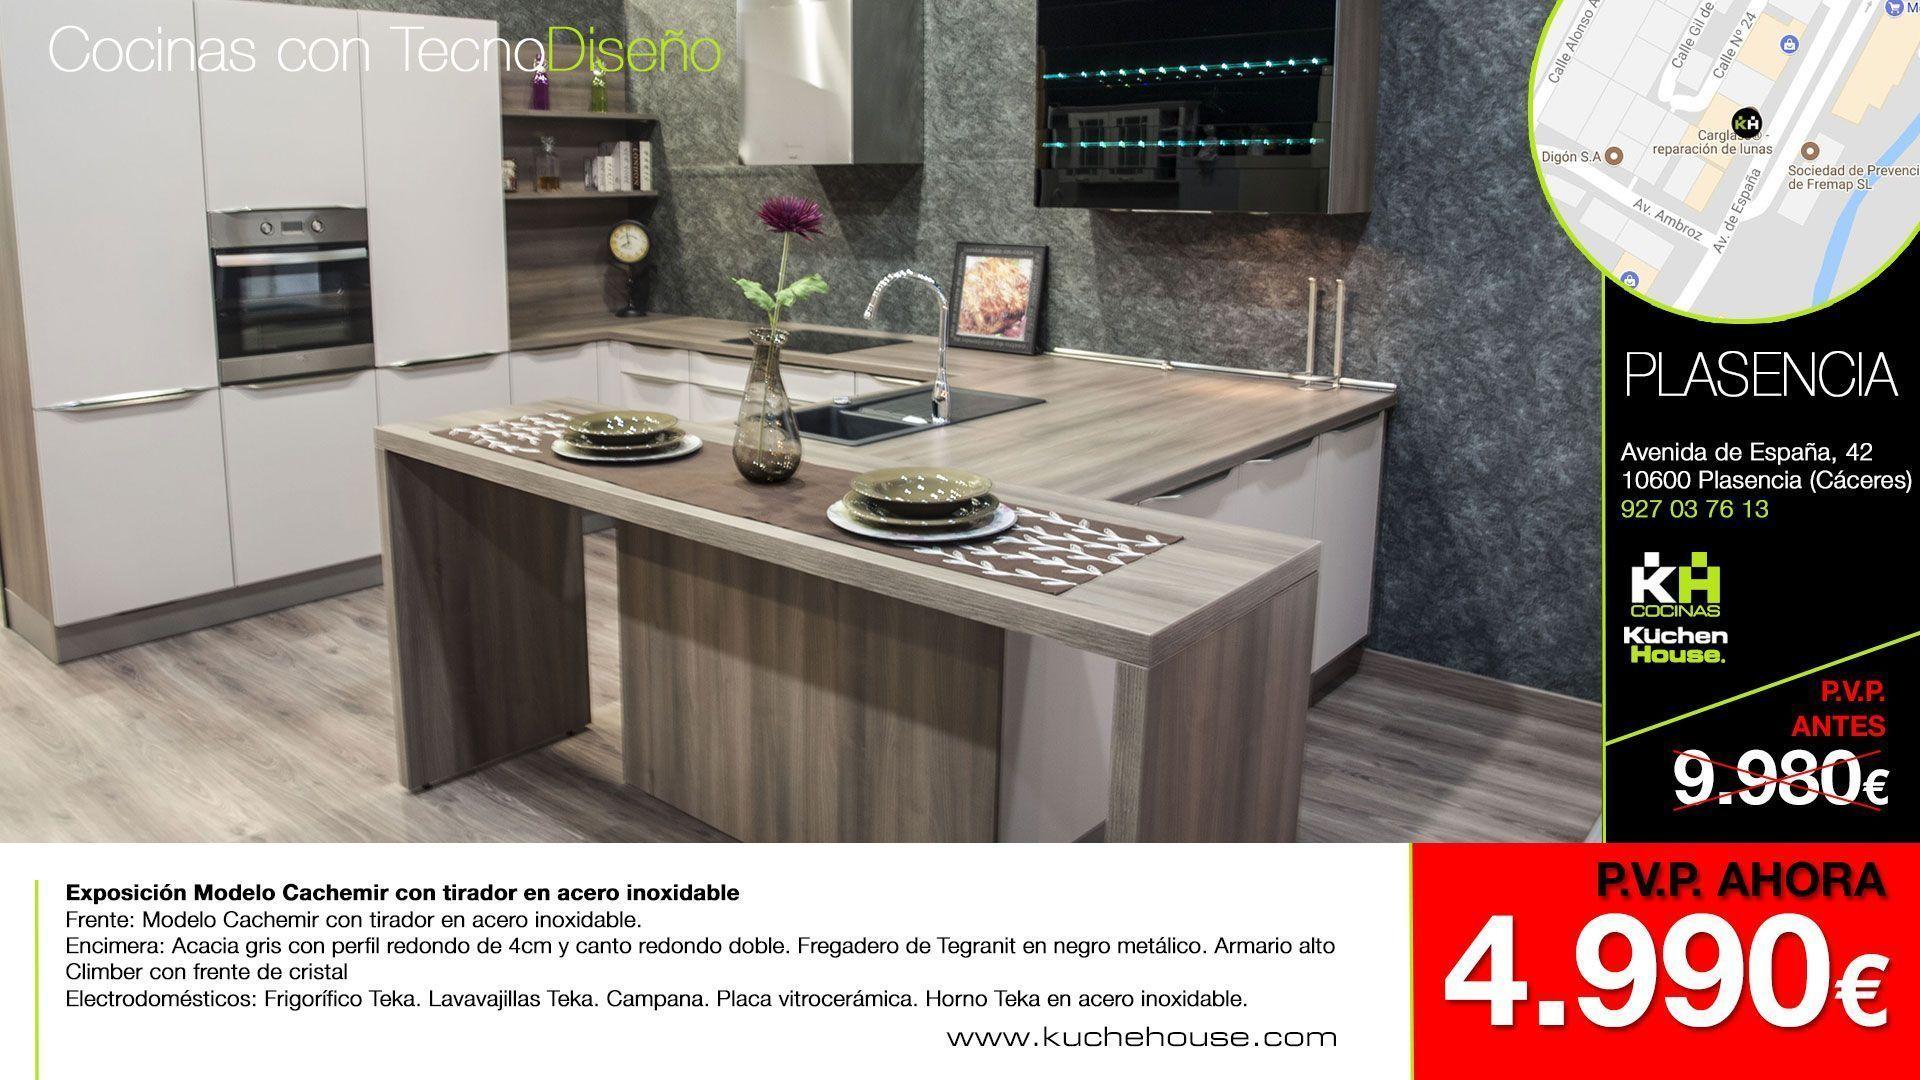 KüchenHouse Plasencia - Cocinas - Armarios - Hogar - Reformas